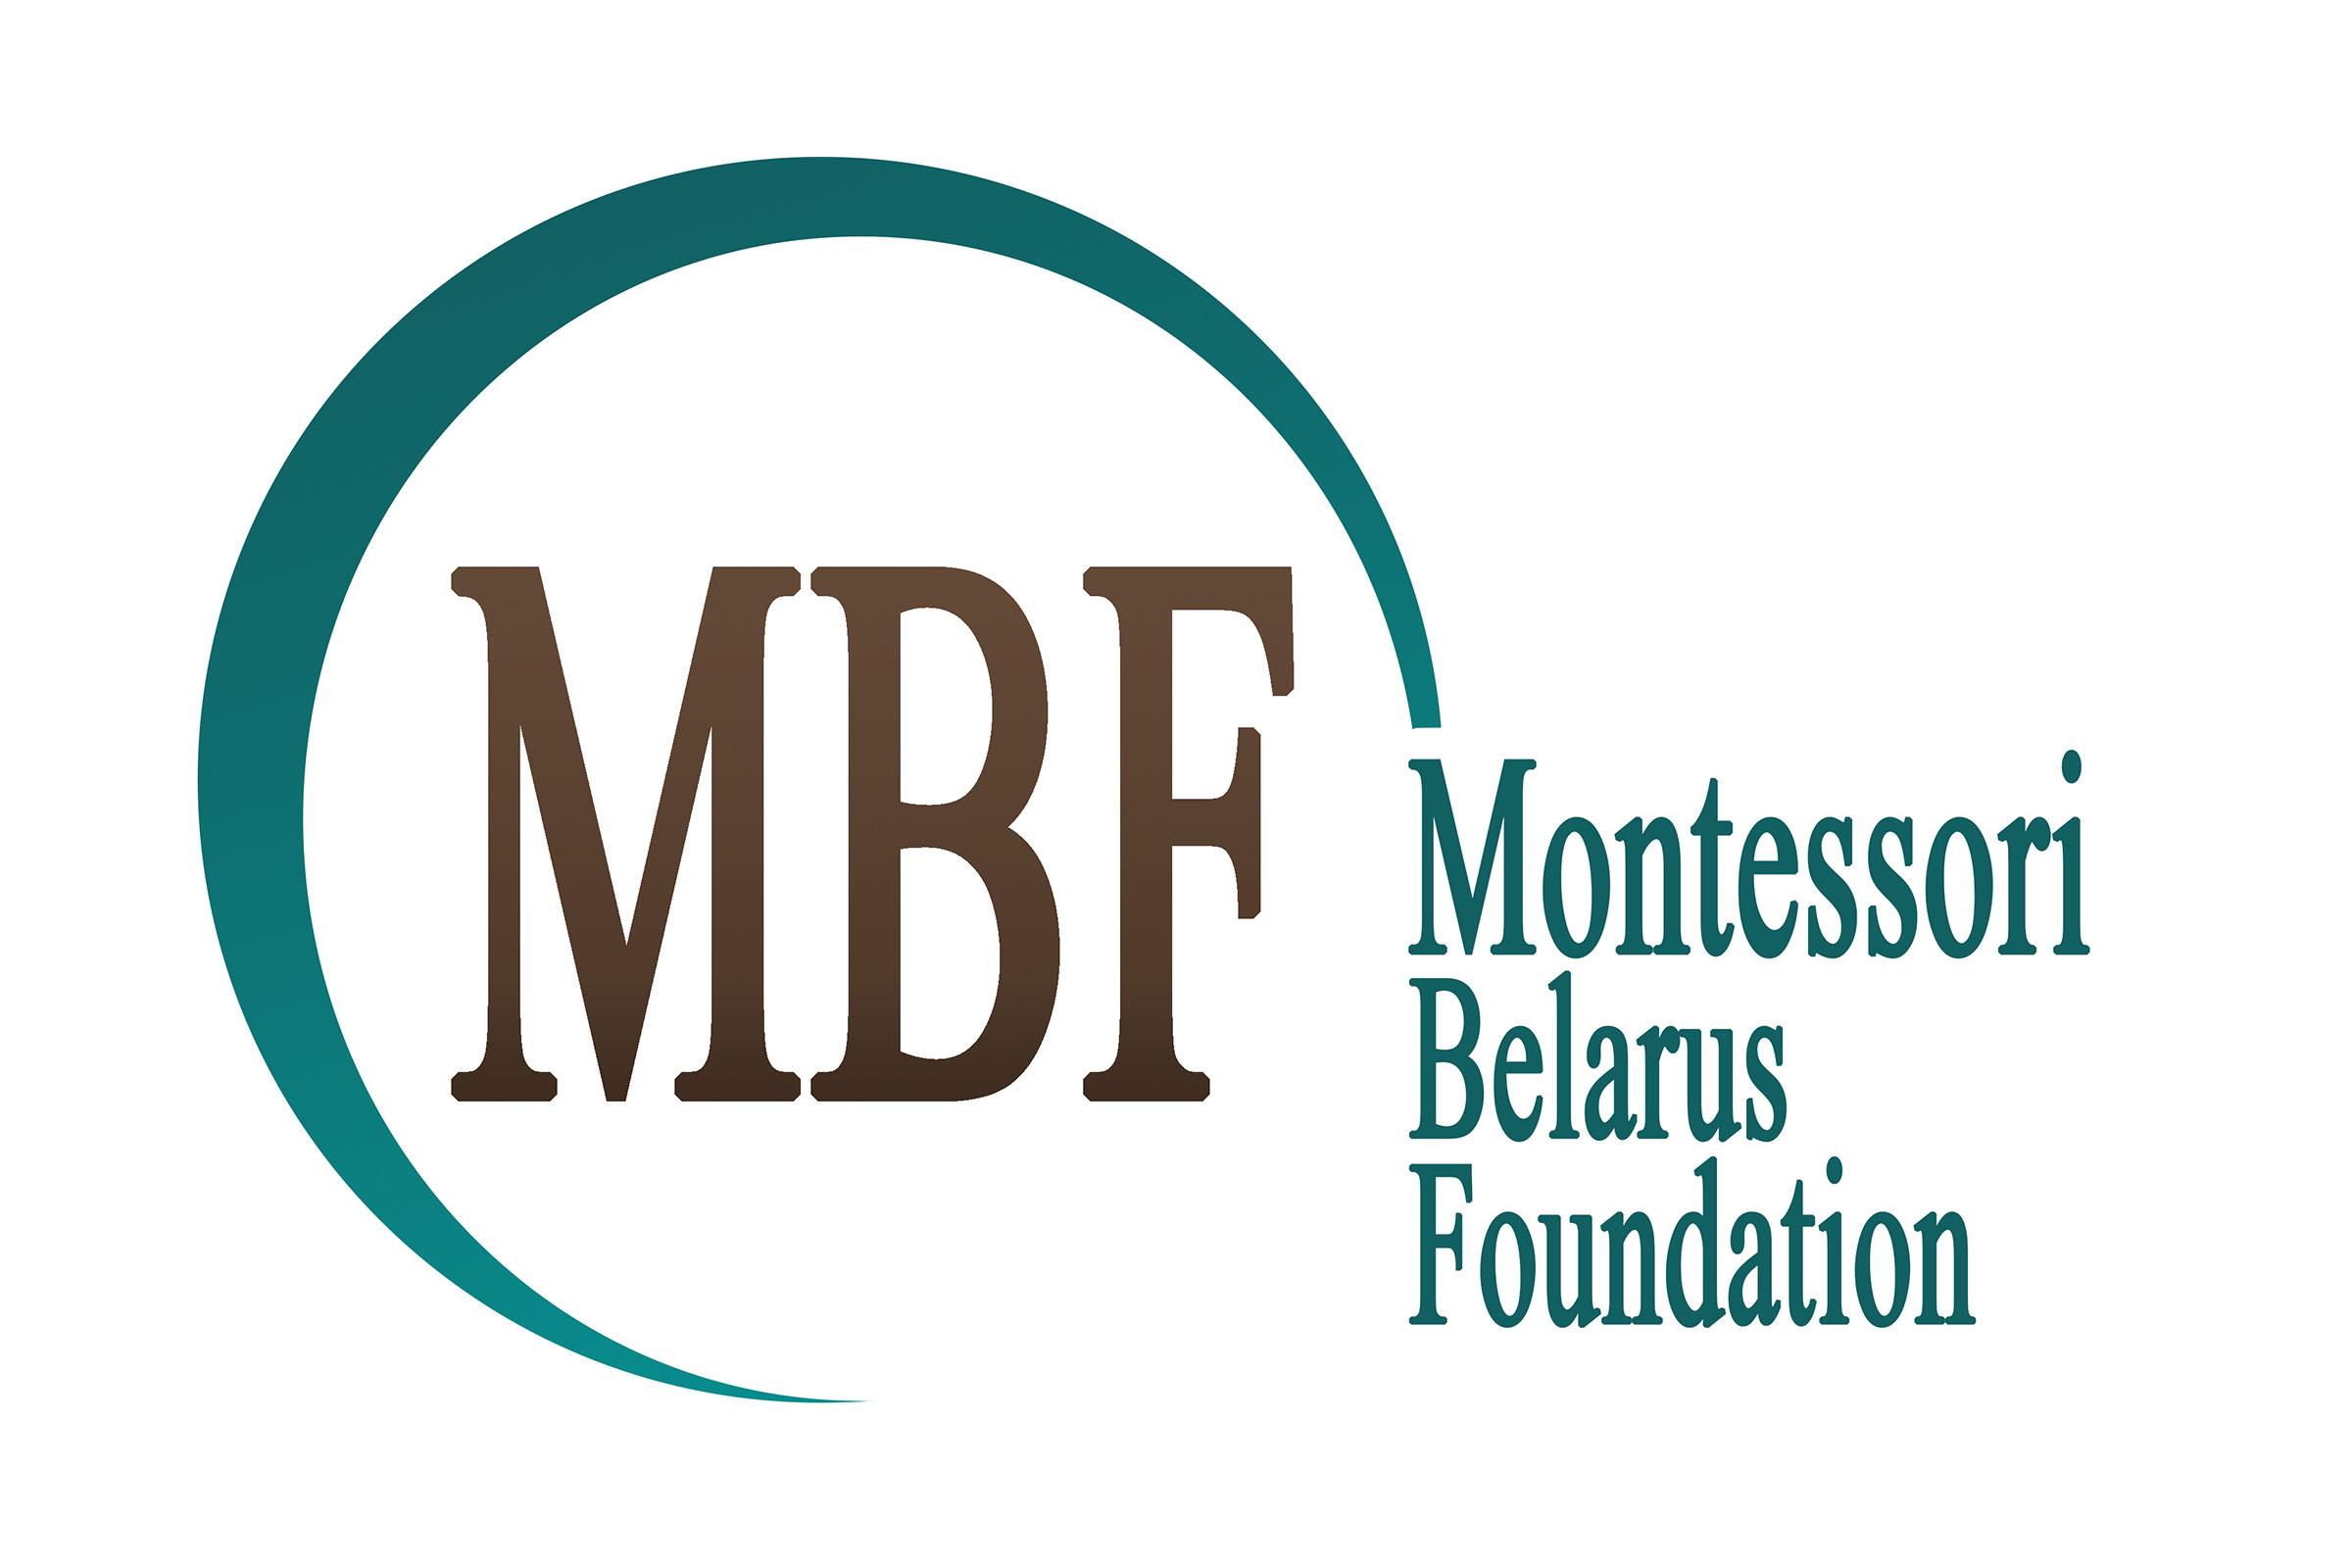 Montessori Belarus Foundation logo